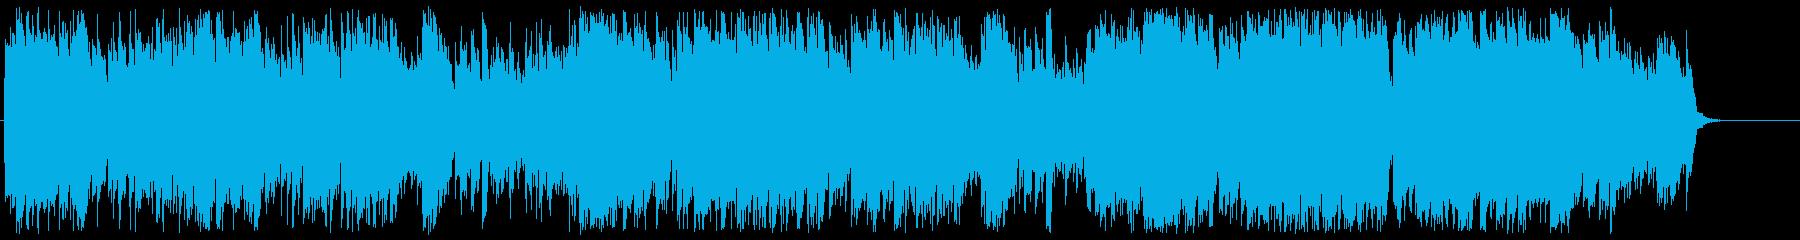 Baroque synth pop's reproduced waveform